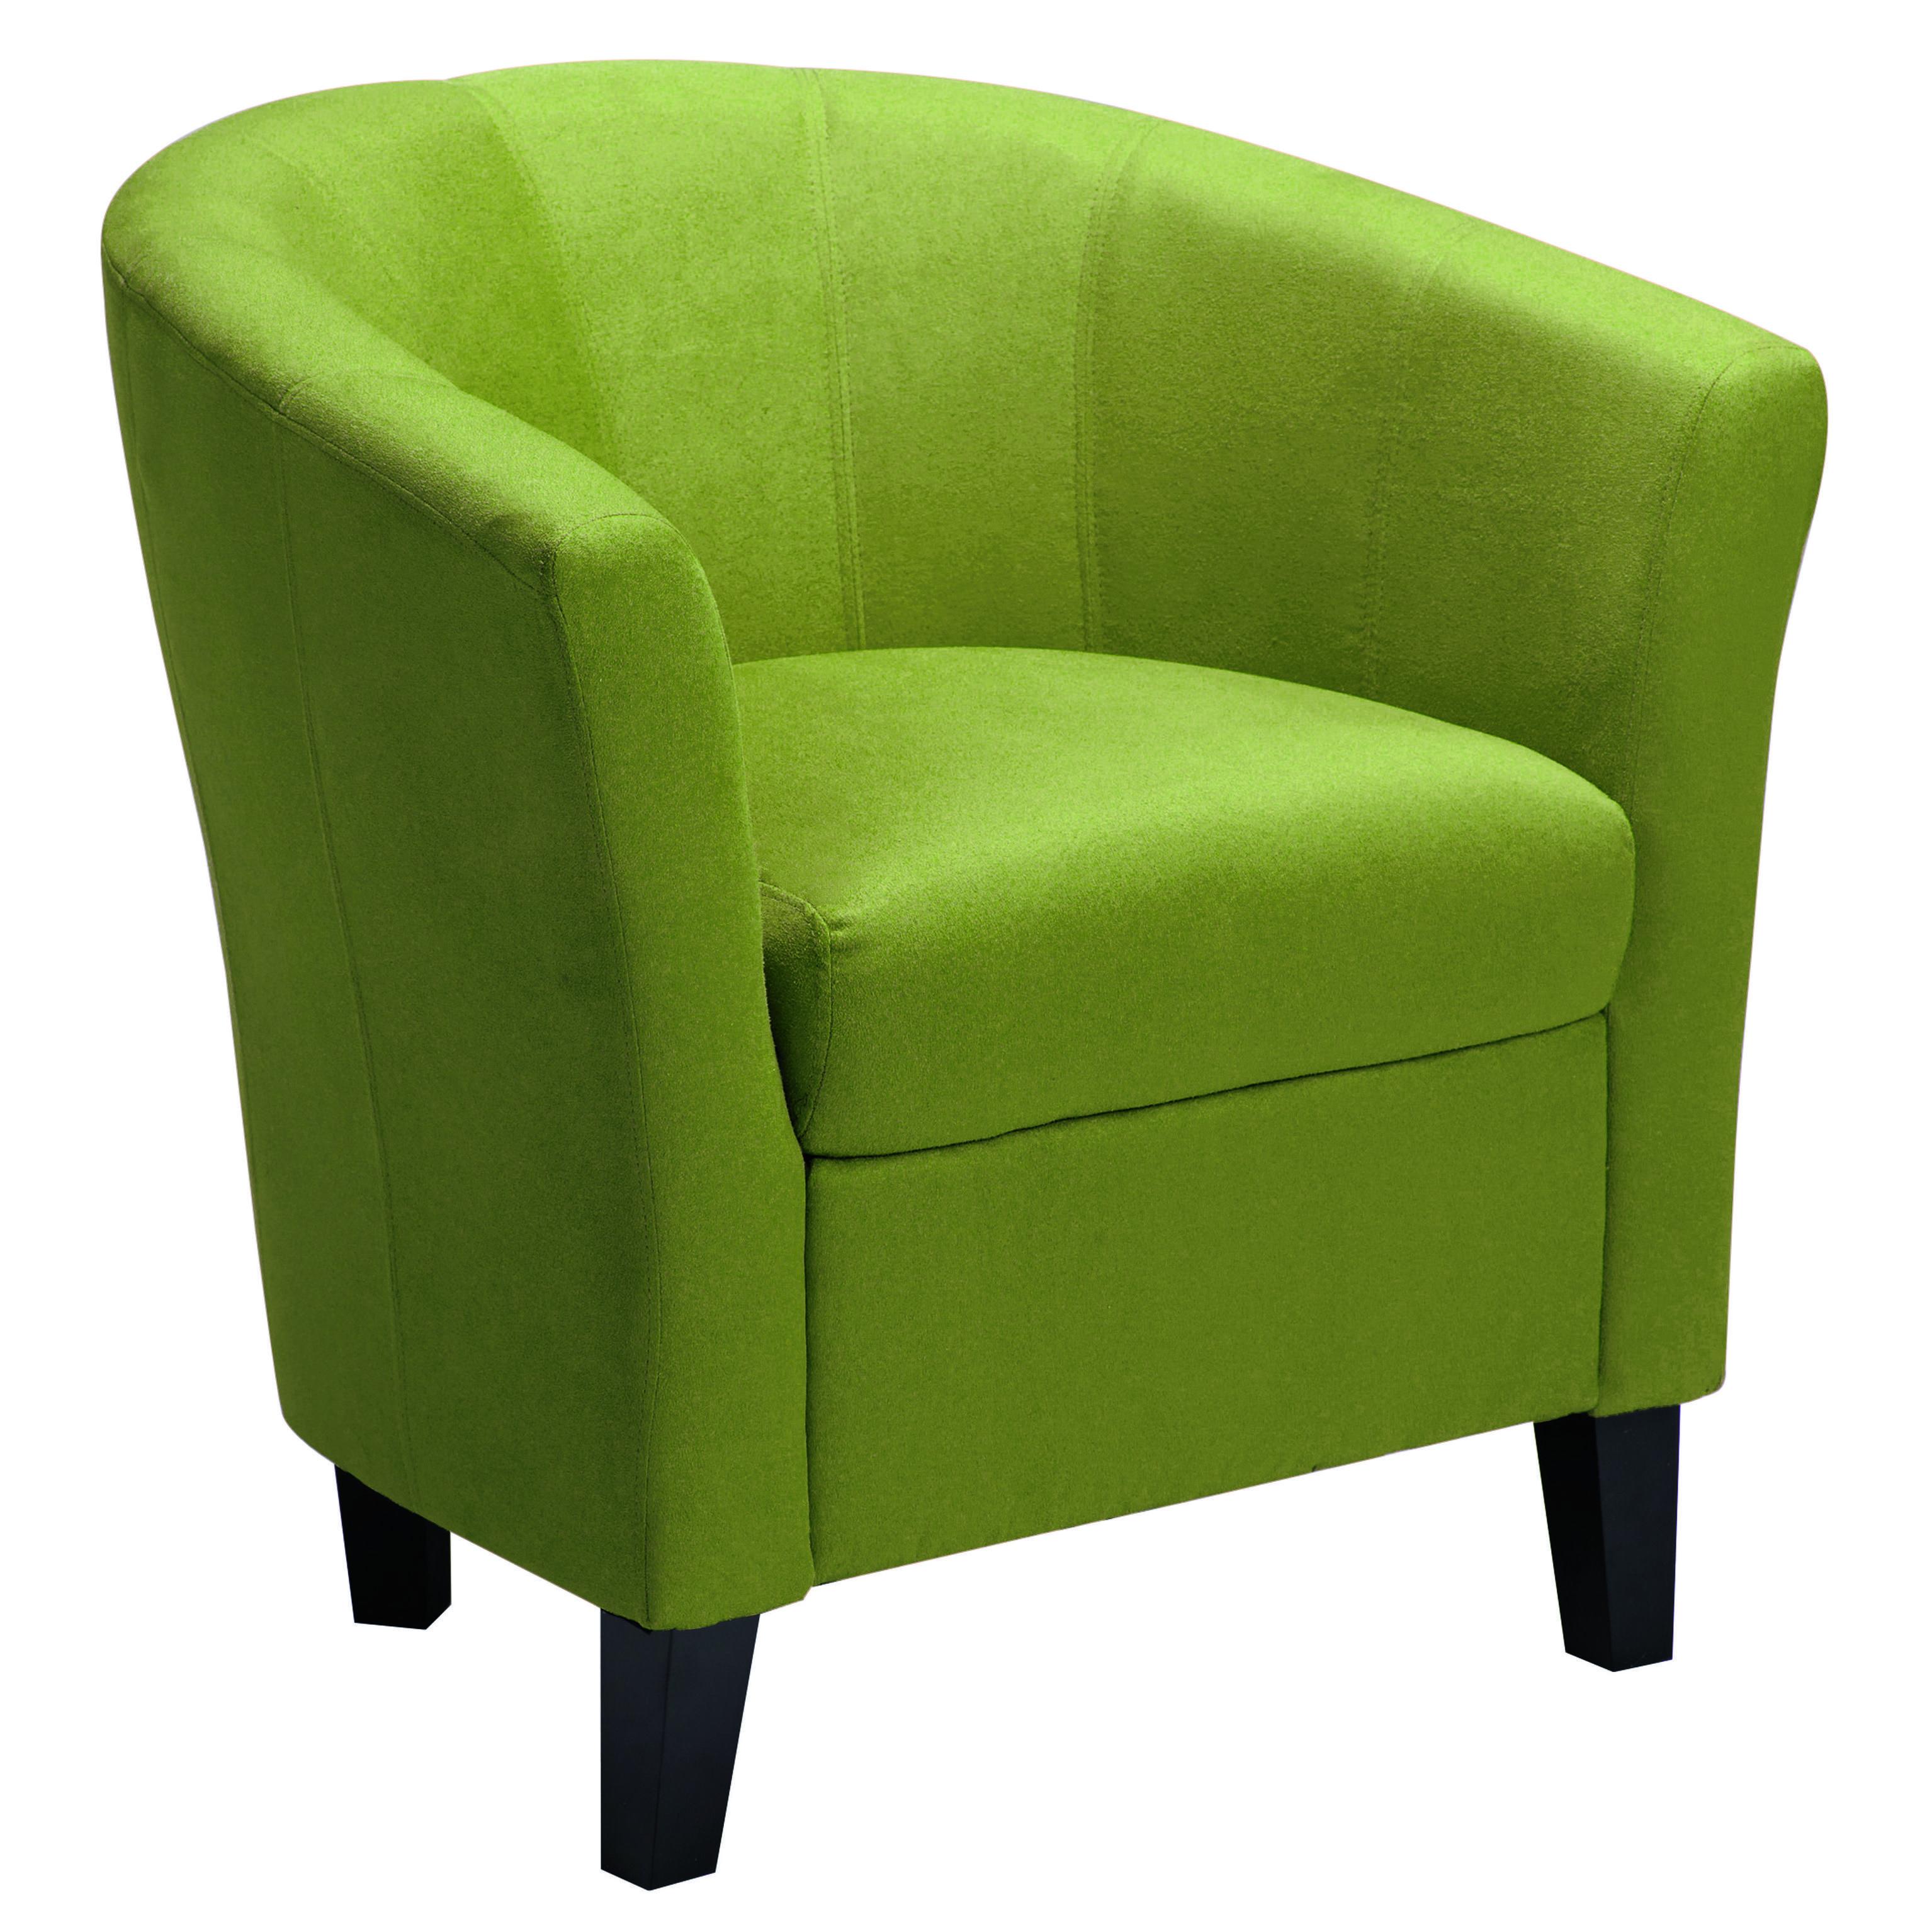 mod tub chair in green micro seude fabric autumn inspired